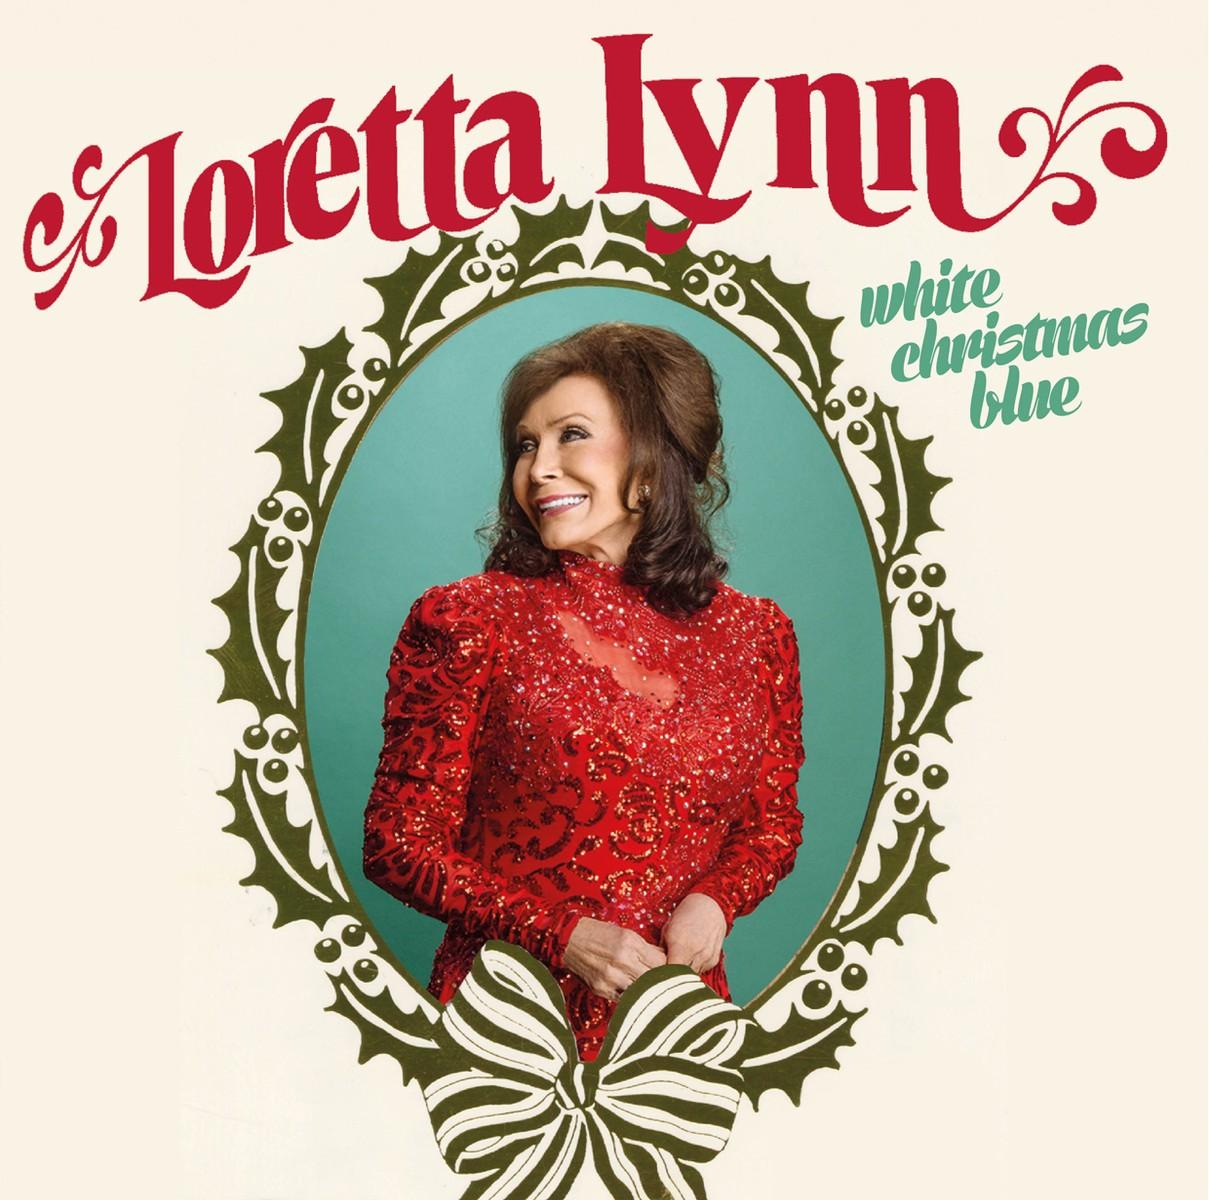 'White Christmas Blue' by Loretta Lynn